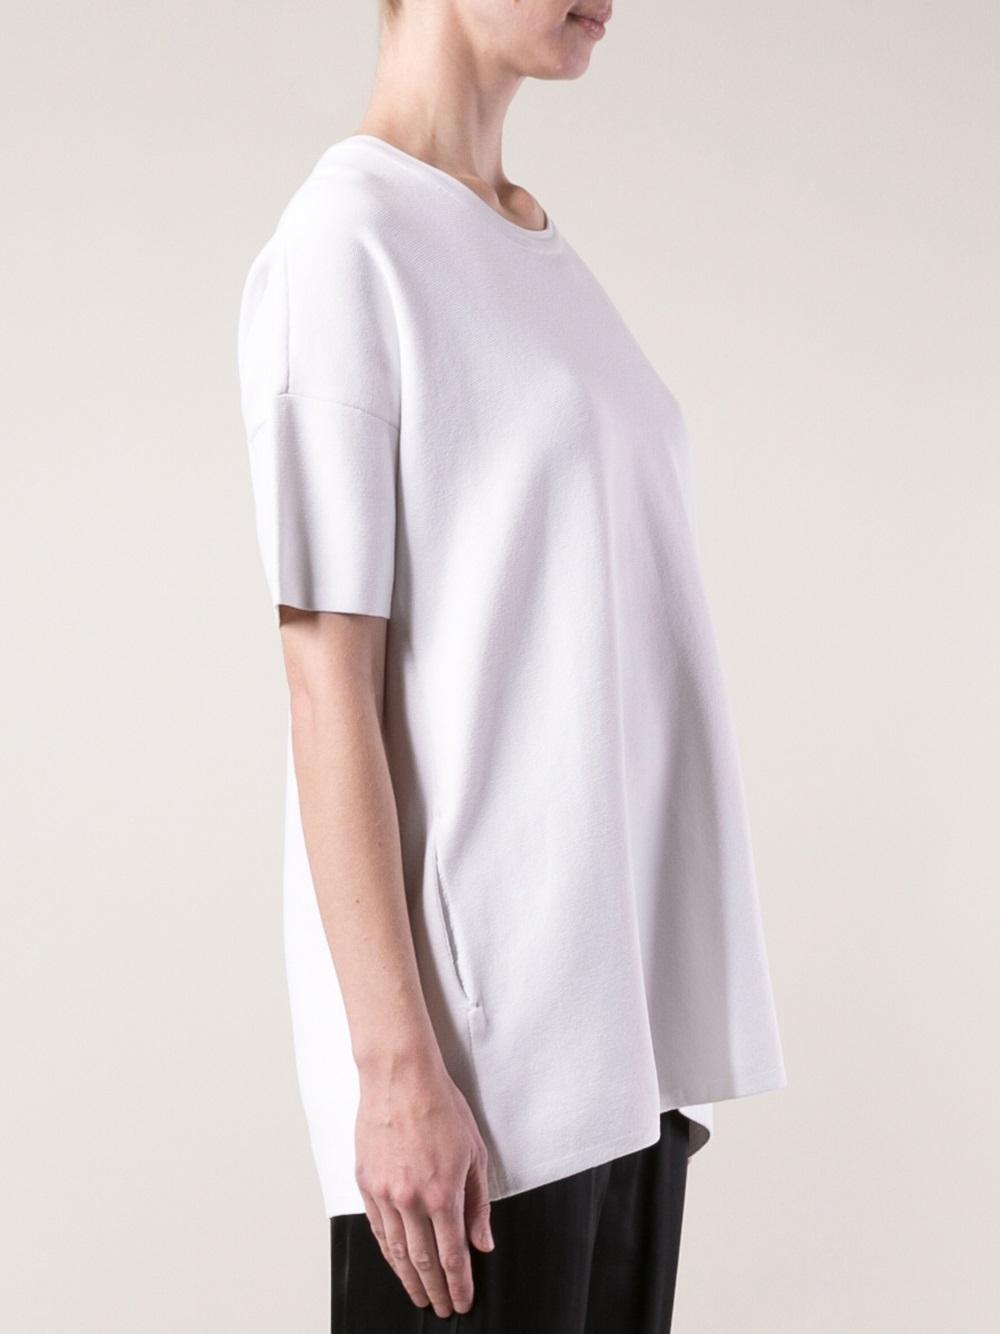 Lyst rag bone clara tshirt in white for Rag and bone white t shirt